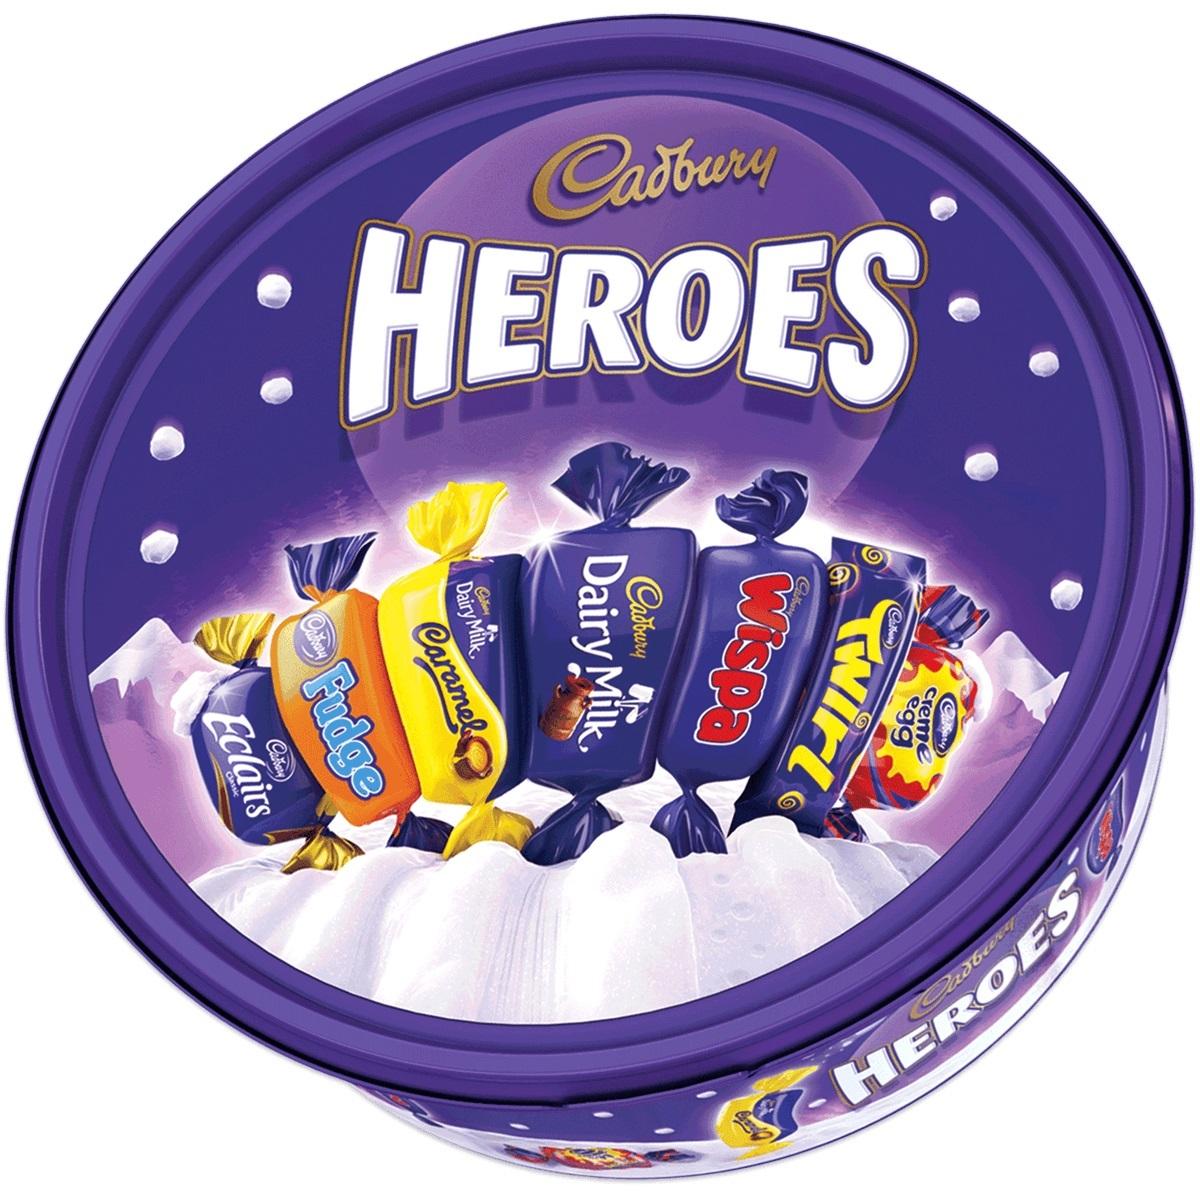 Cadbury Heroes Tub (660g) image